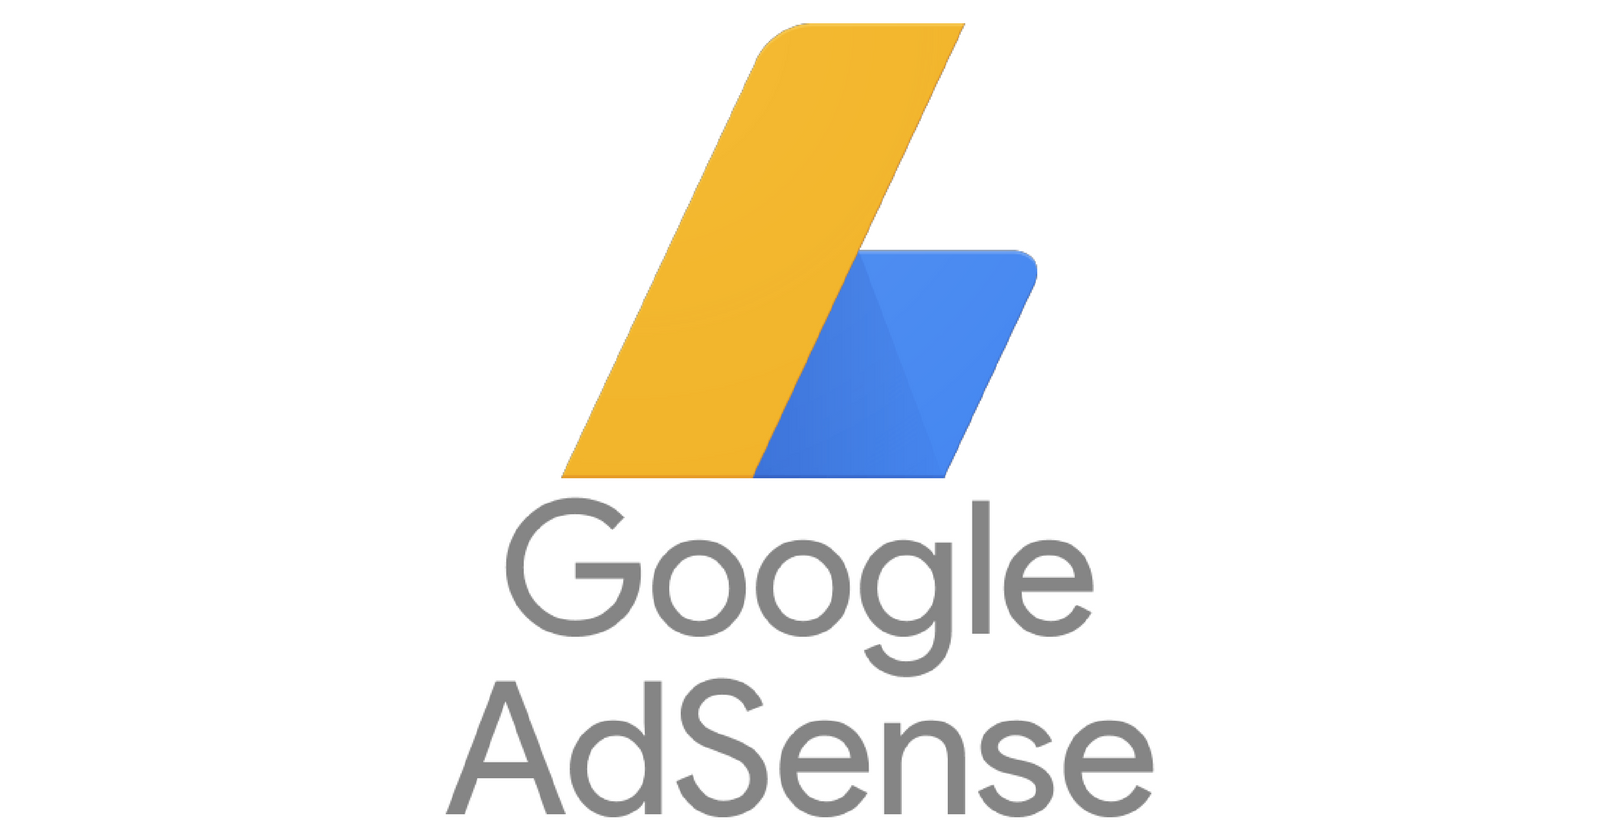 tips cepat approve google adsense - rio bermano